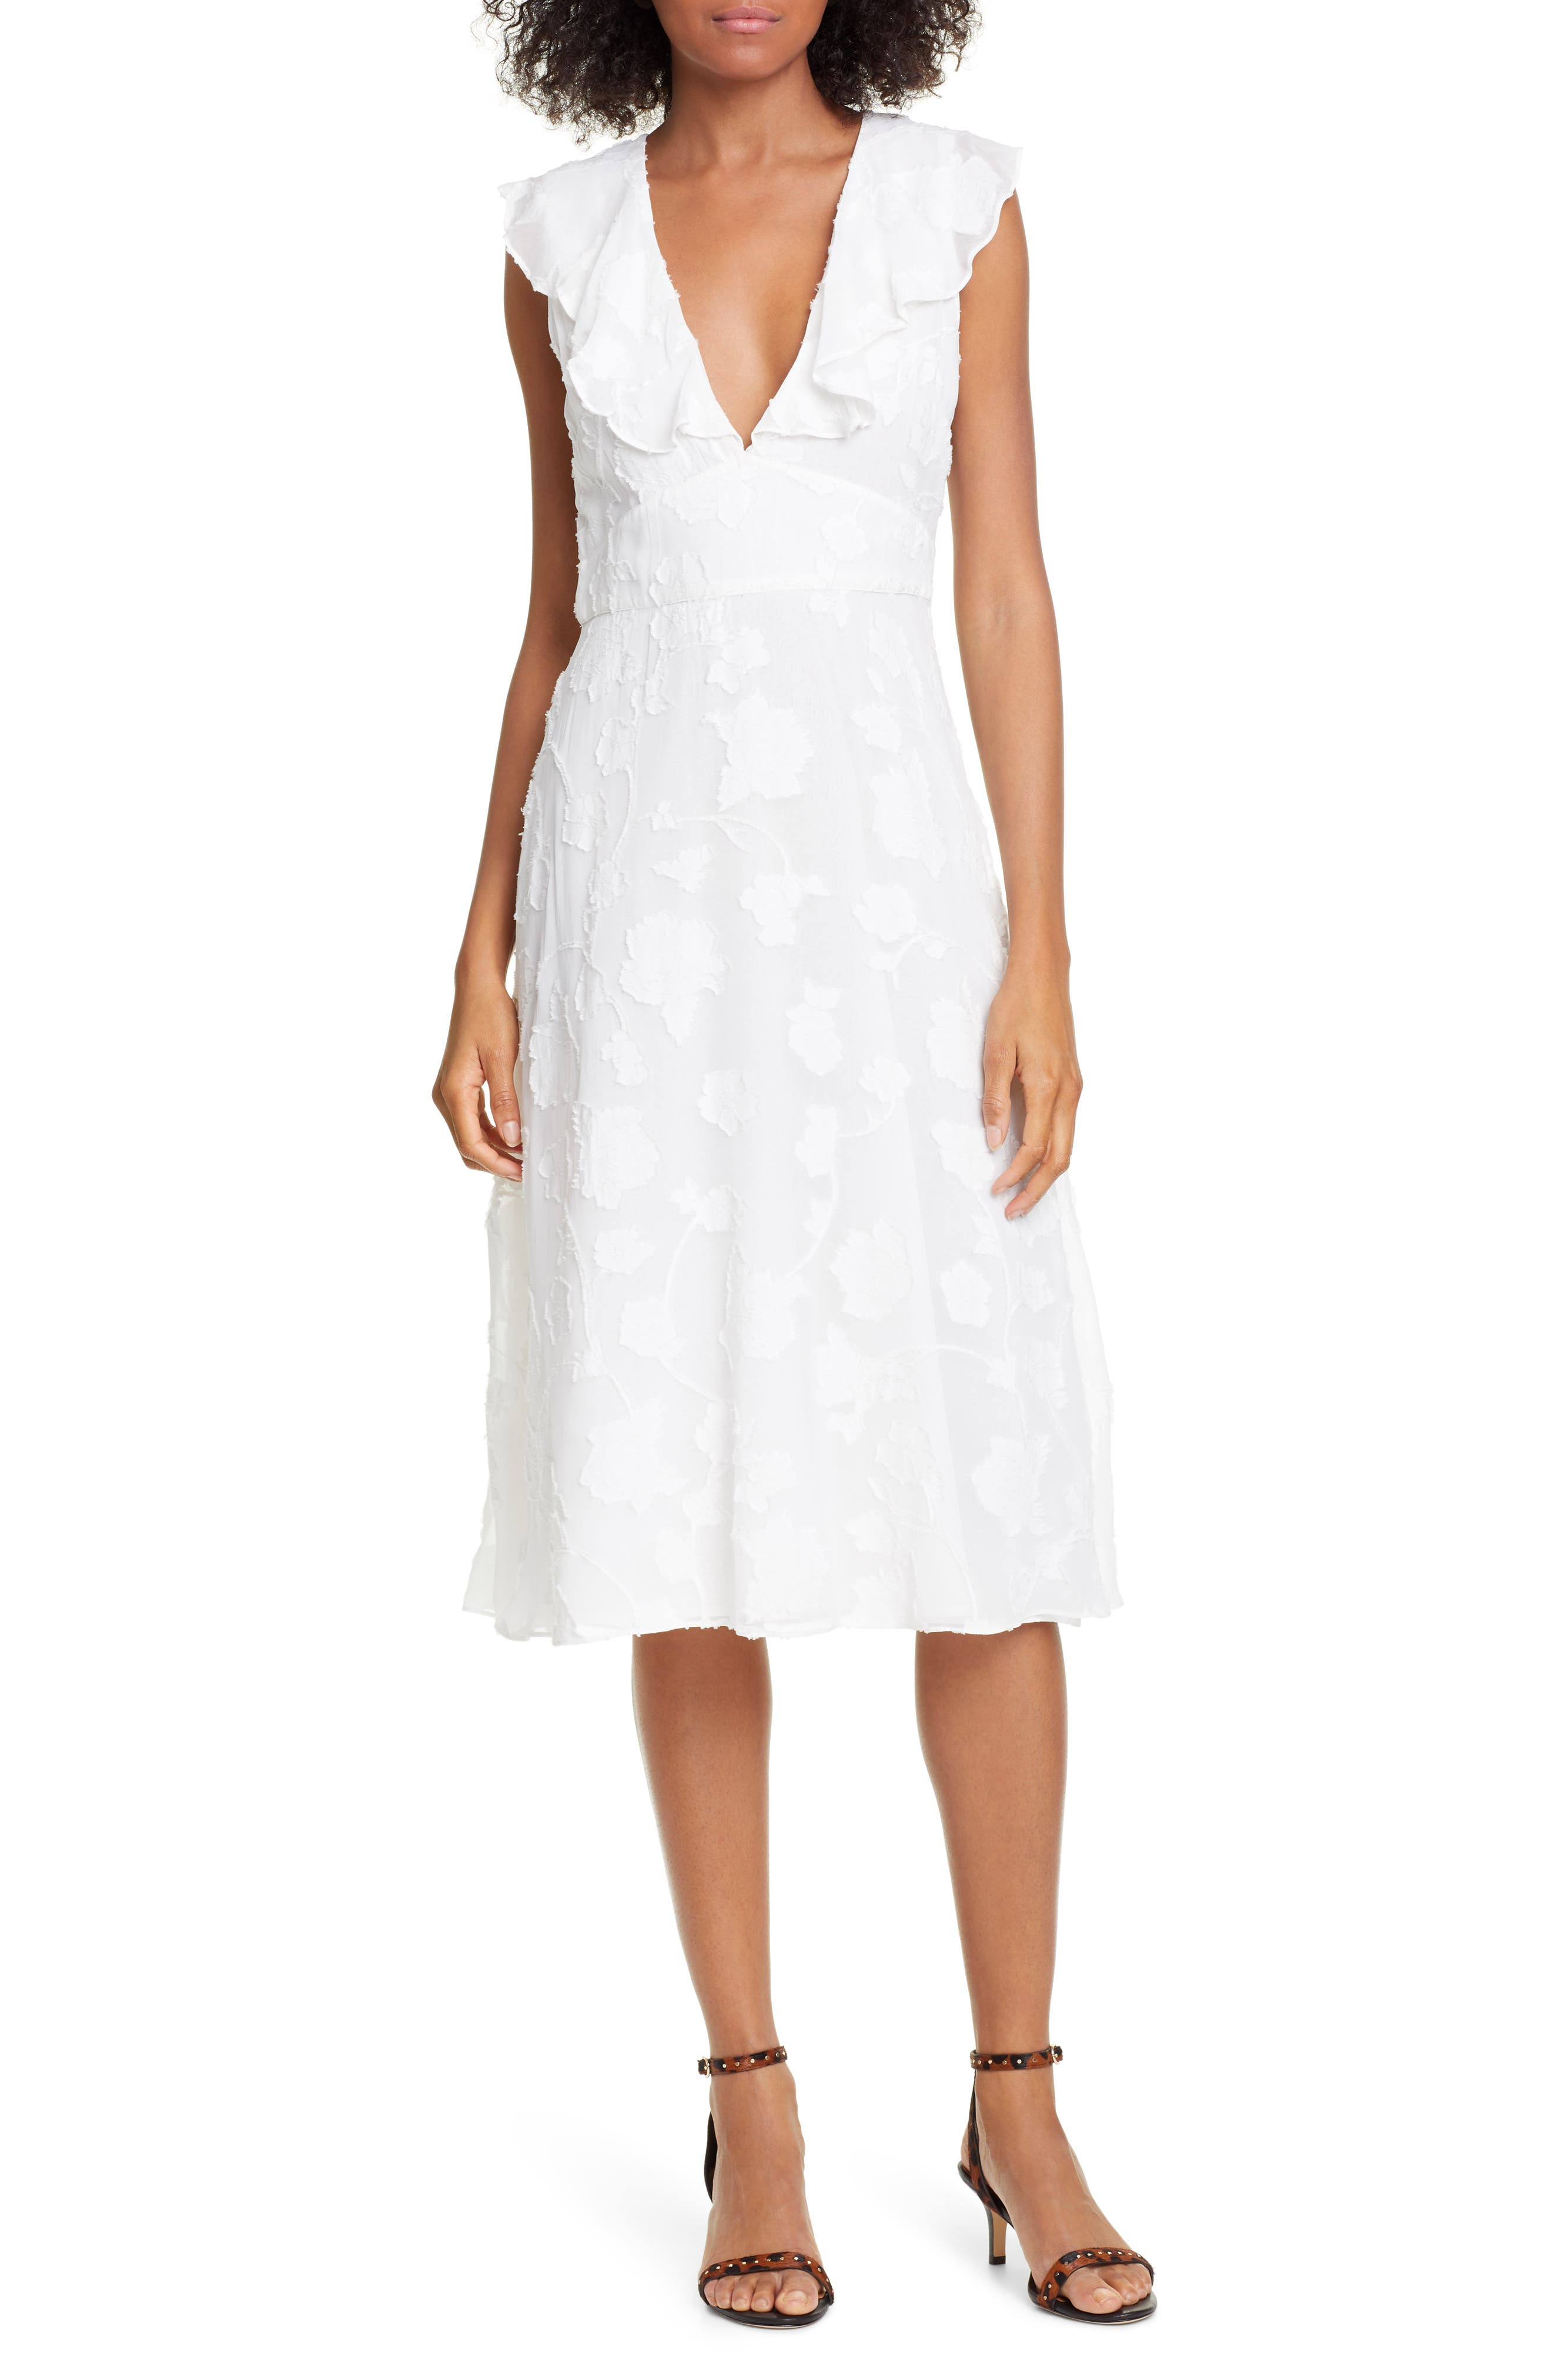 Joie Adella Burnout Dress, Ivory